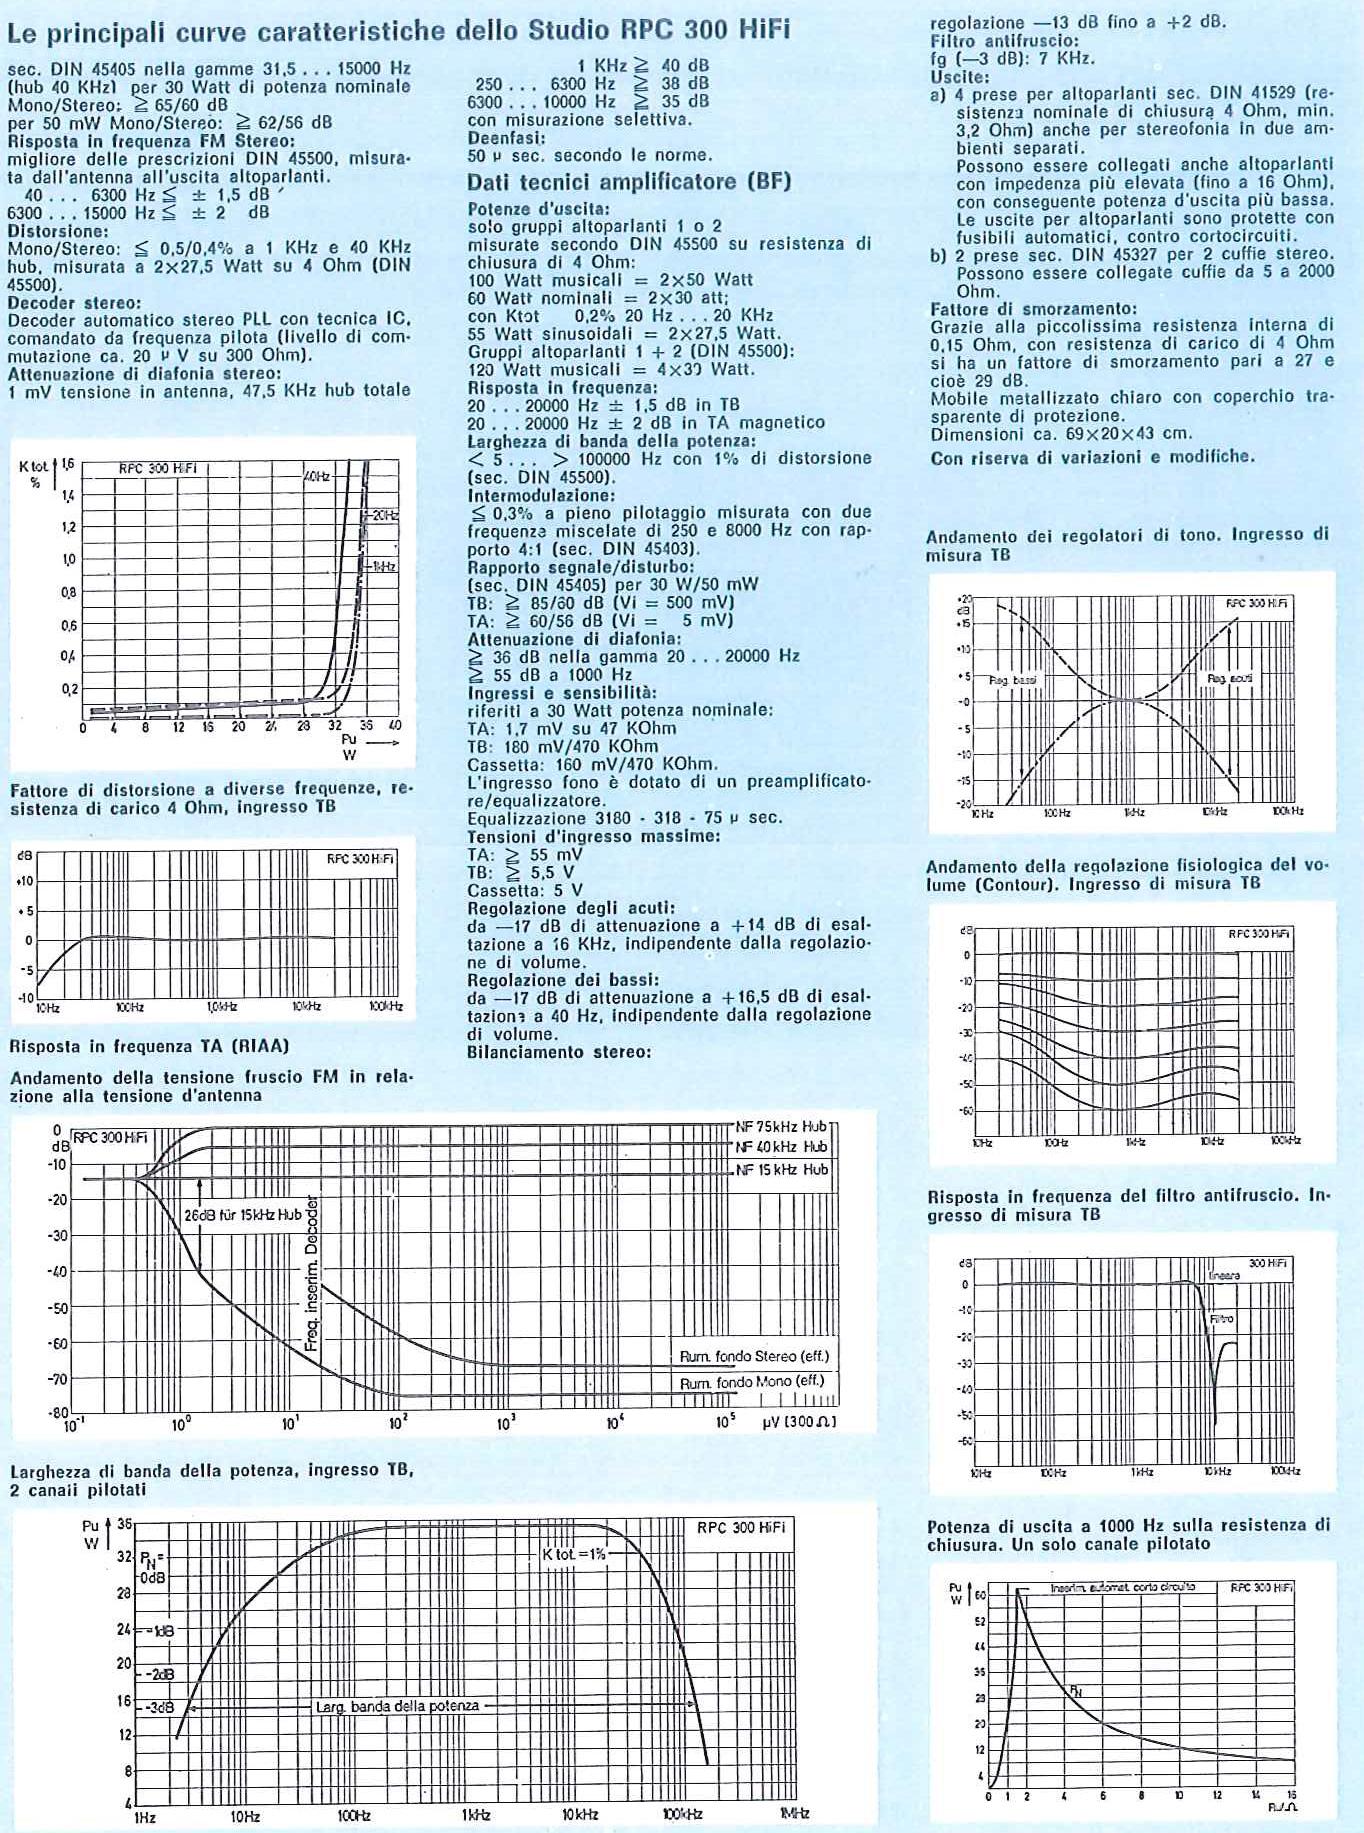 Grundig Studio RPC 300 Dati Tecnici e Principali Curve Caratteristiche